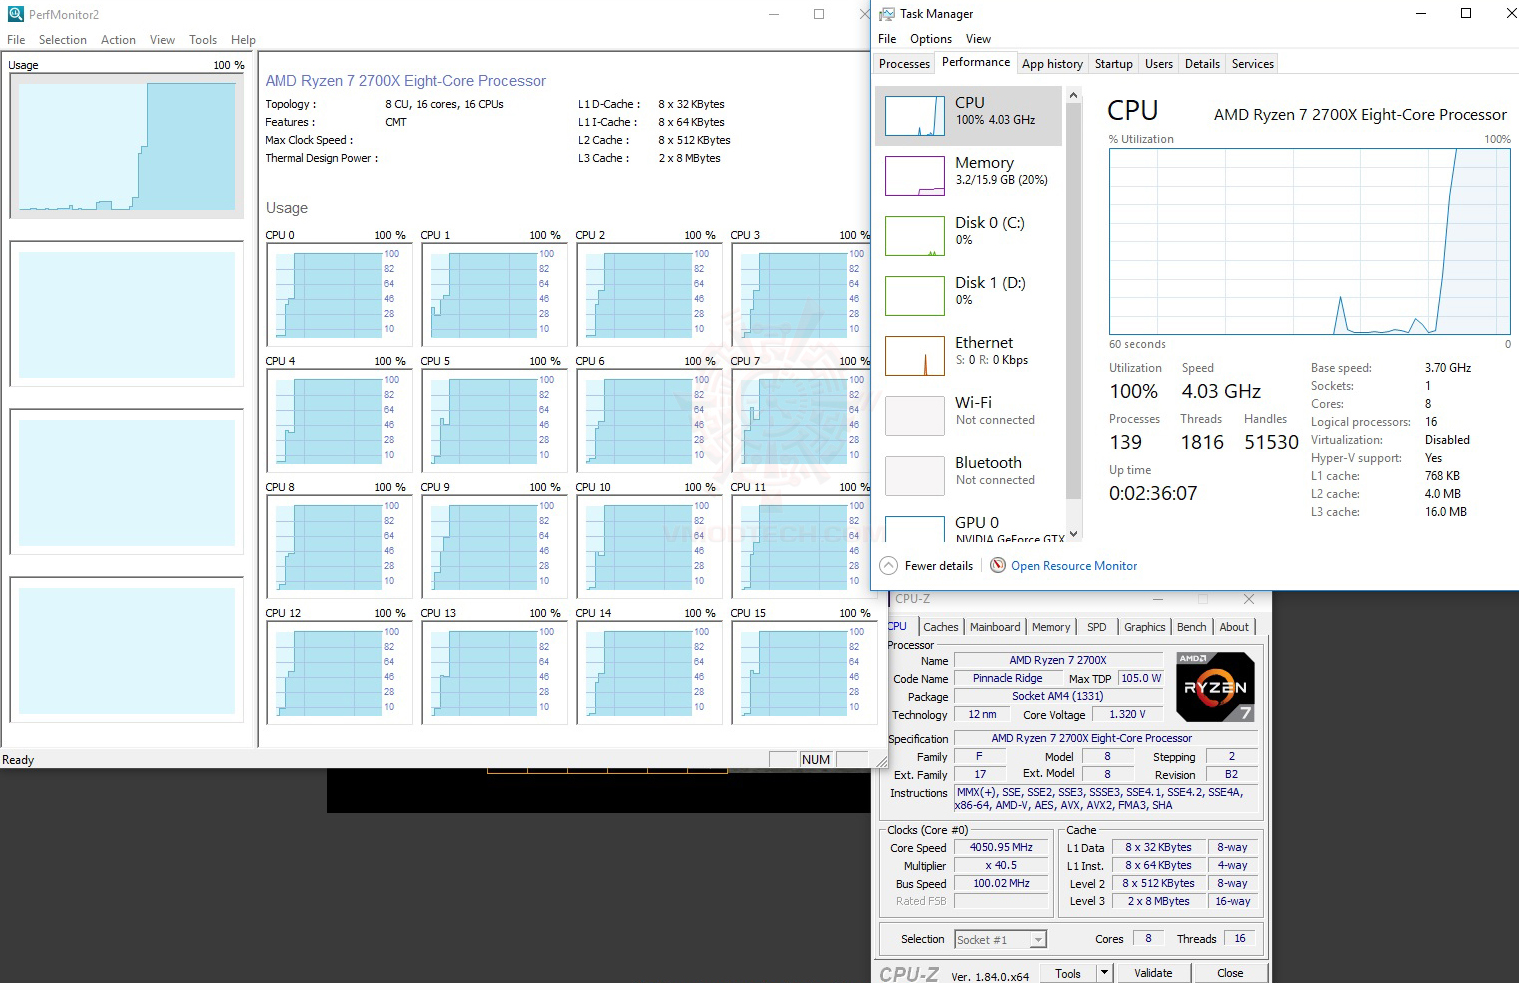 all core1 AMD RYZEN 7 2700X PROCESSOR REVIEW